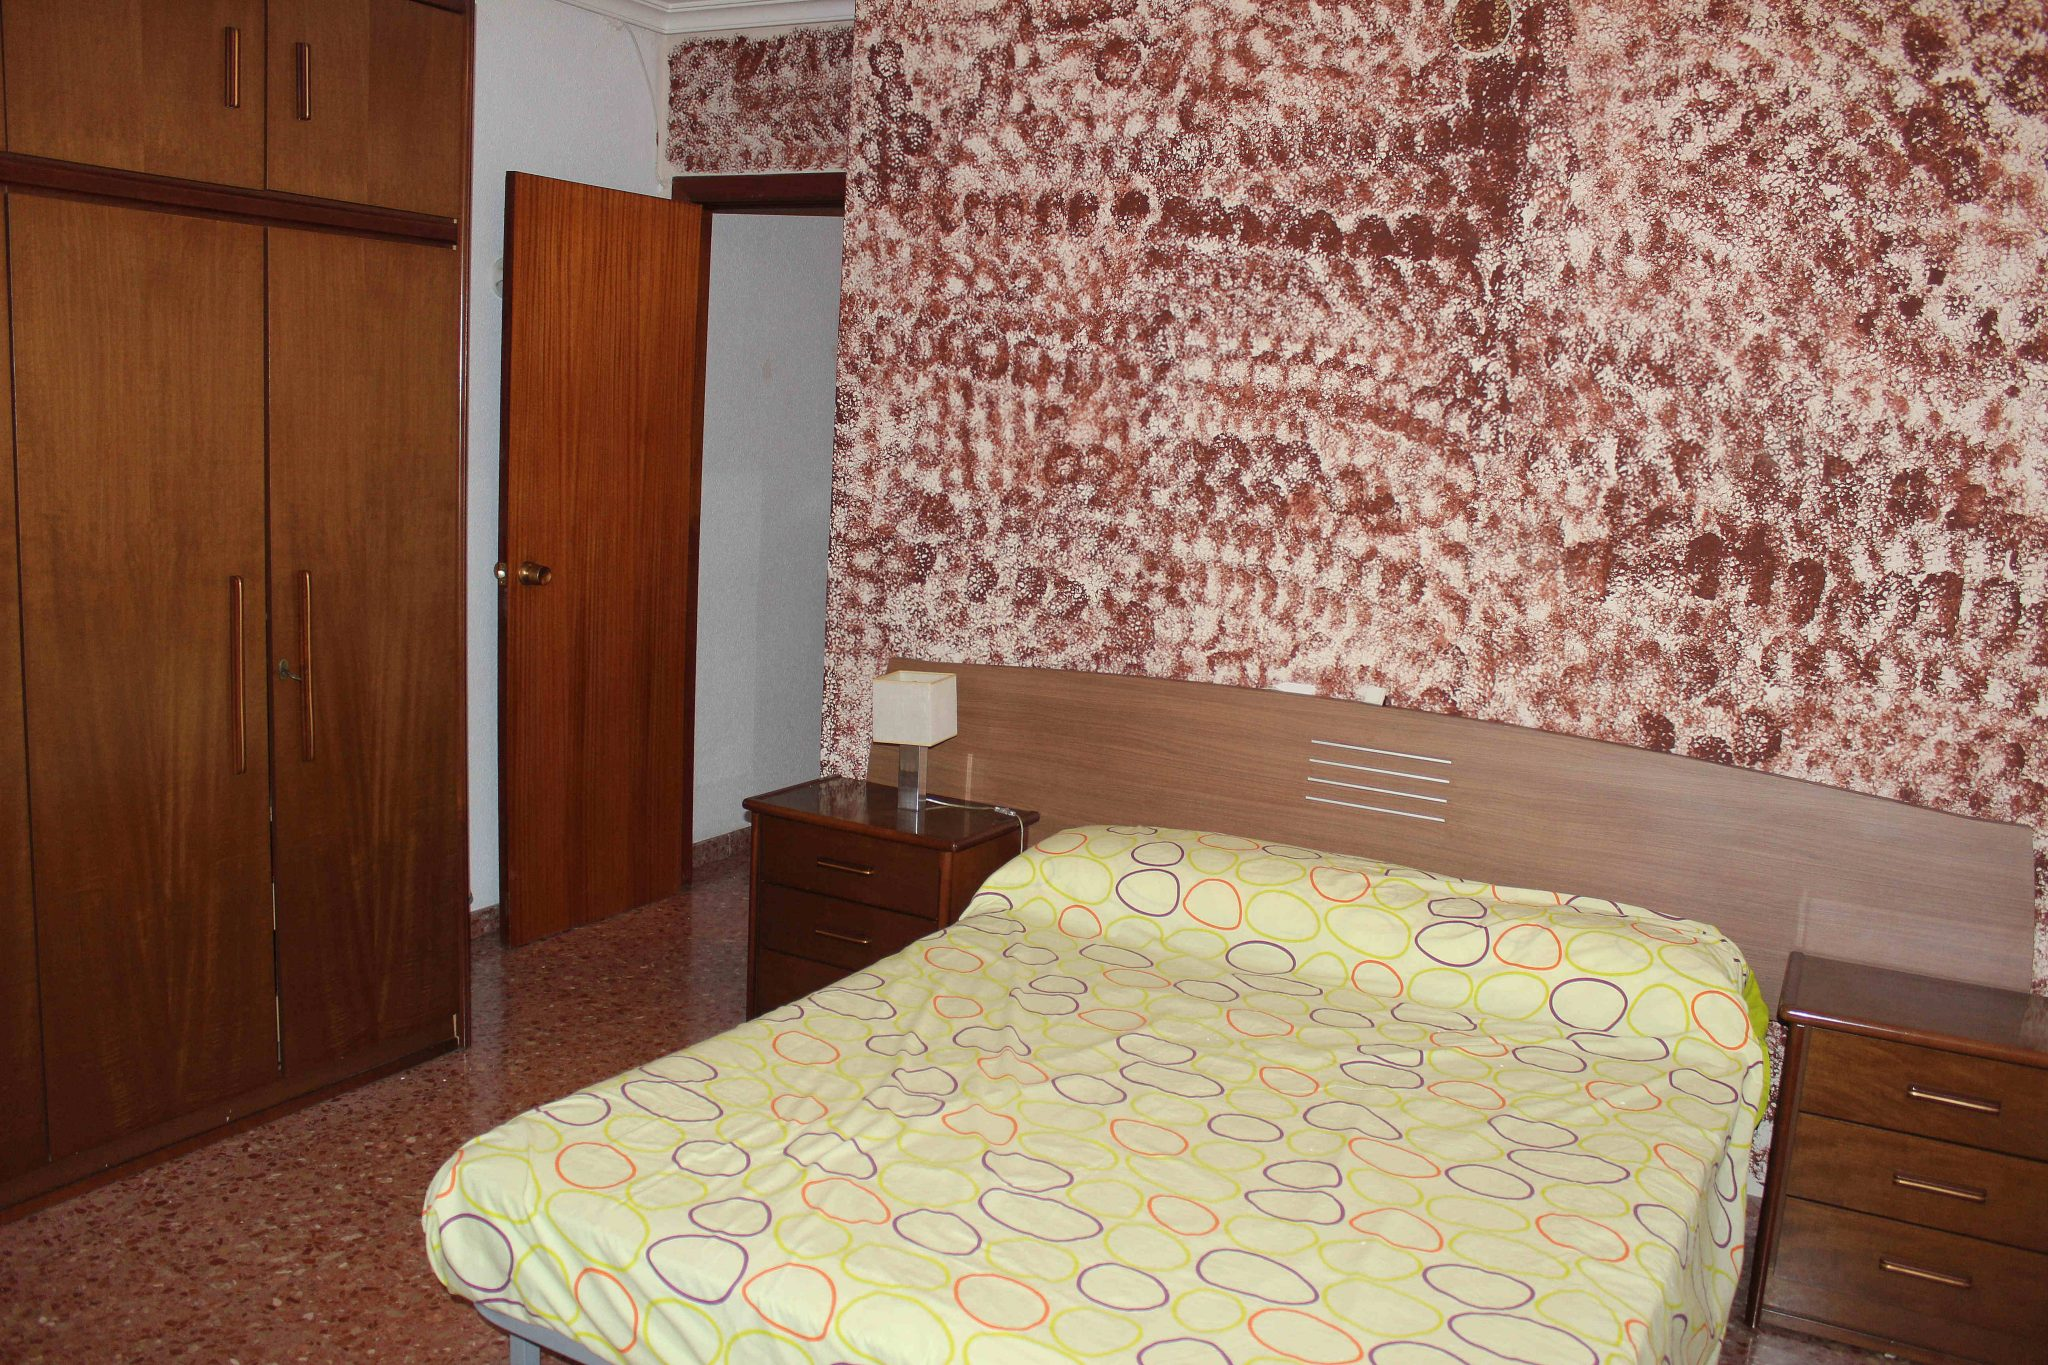 Matrimonio Bed Properties : A fotos piso matrimonio mpr inmobiliaria vinaròs inmompr